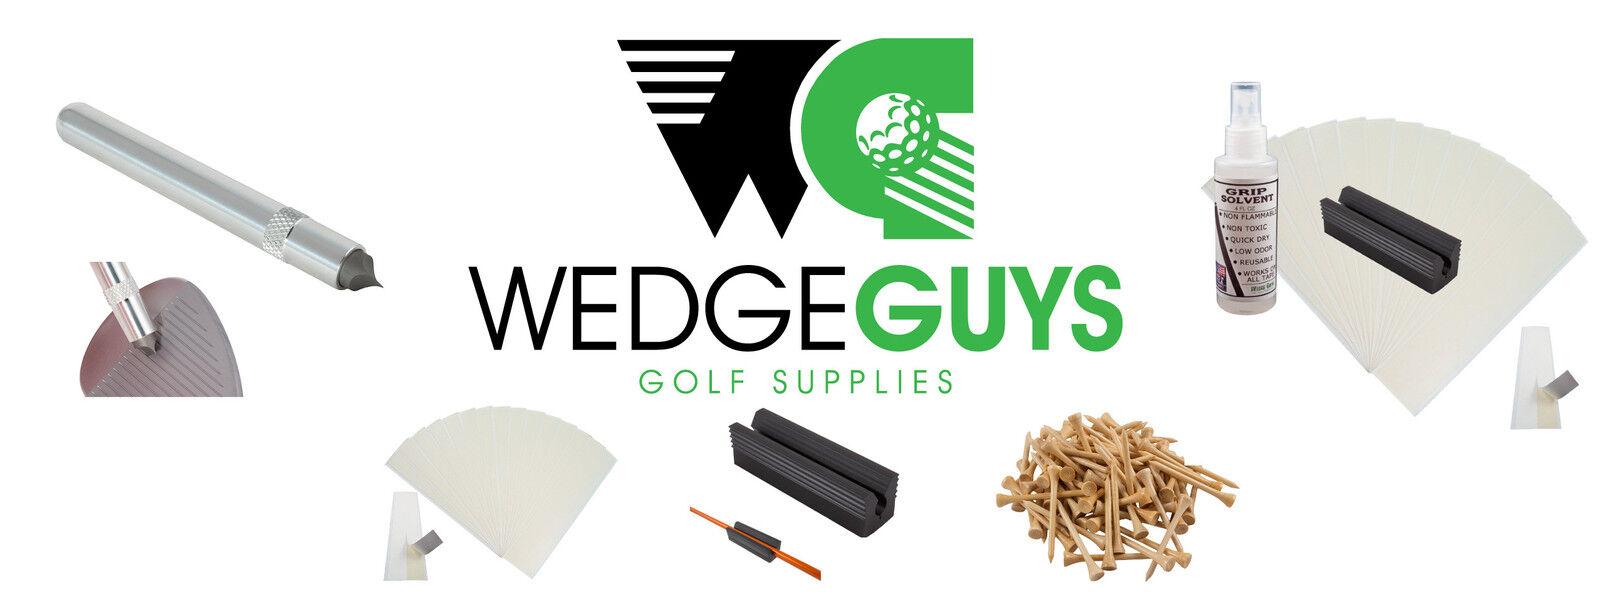 Wedge Guys: Golf Supplies